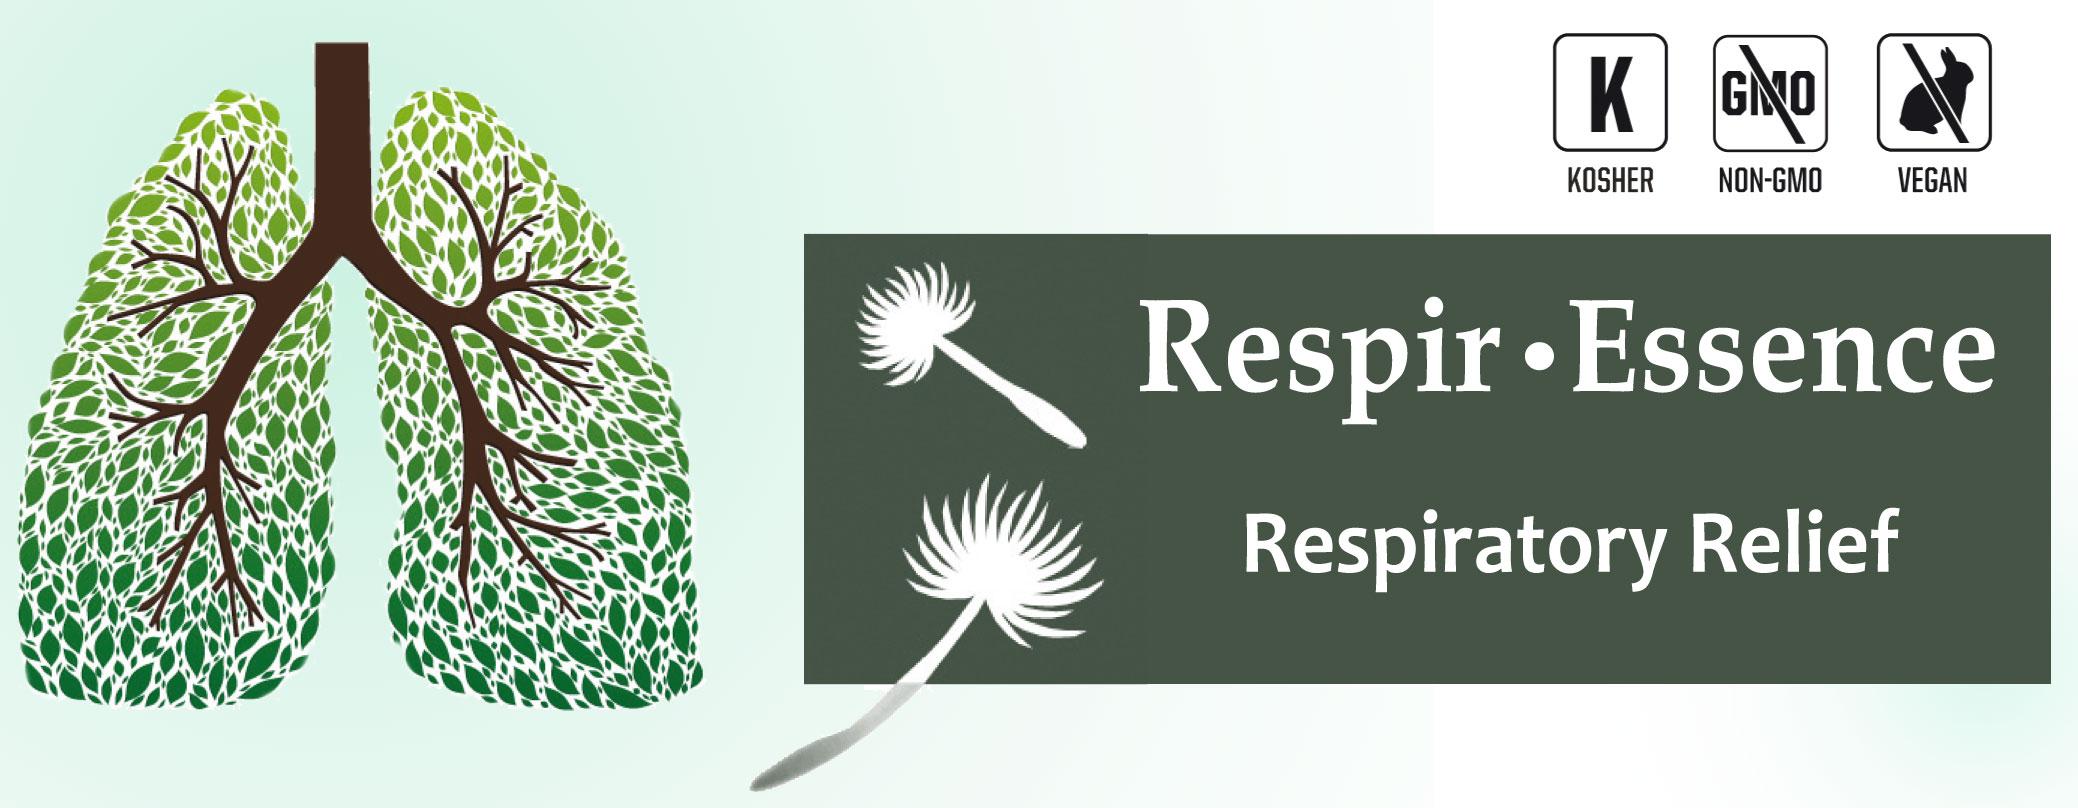 Respiressence banner